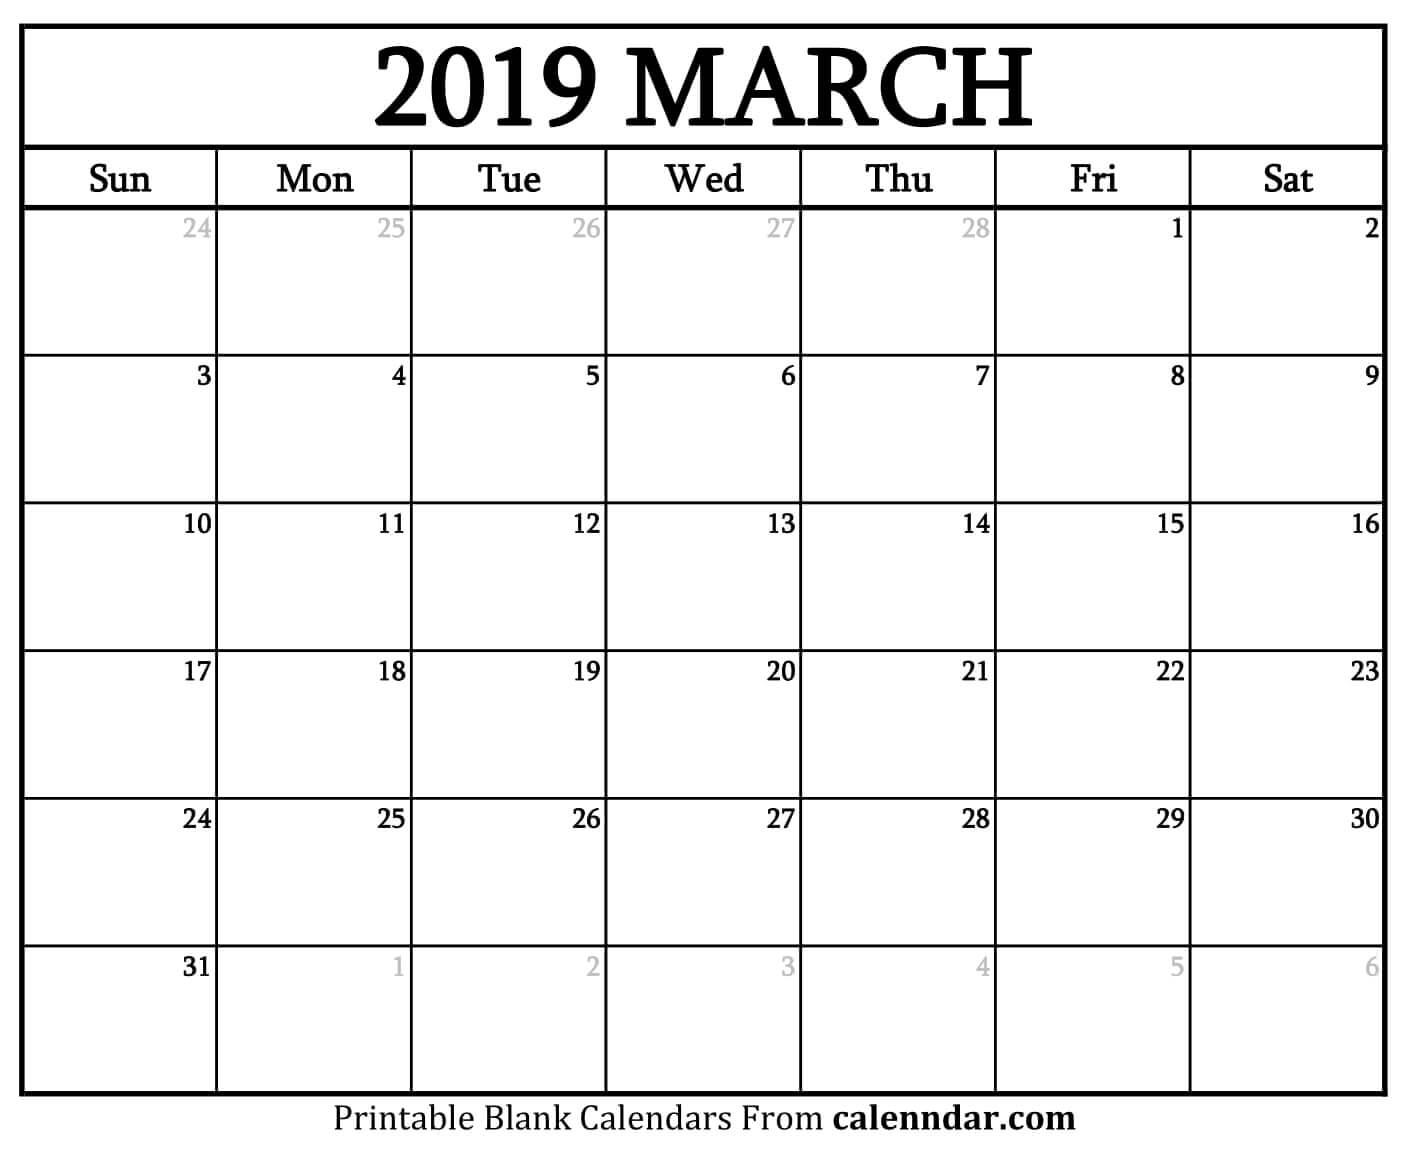 March 2019 Printable Blank Calendar